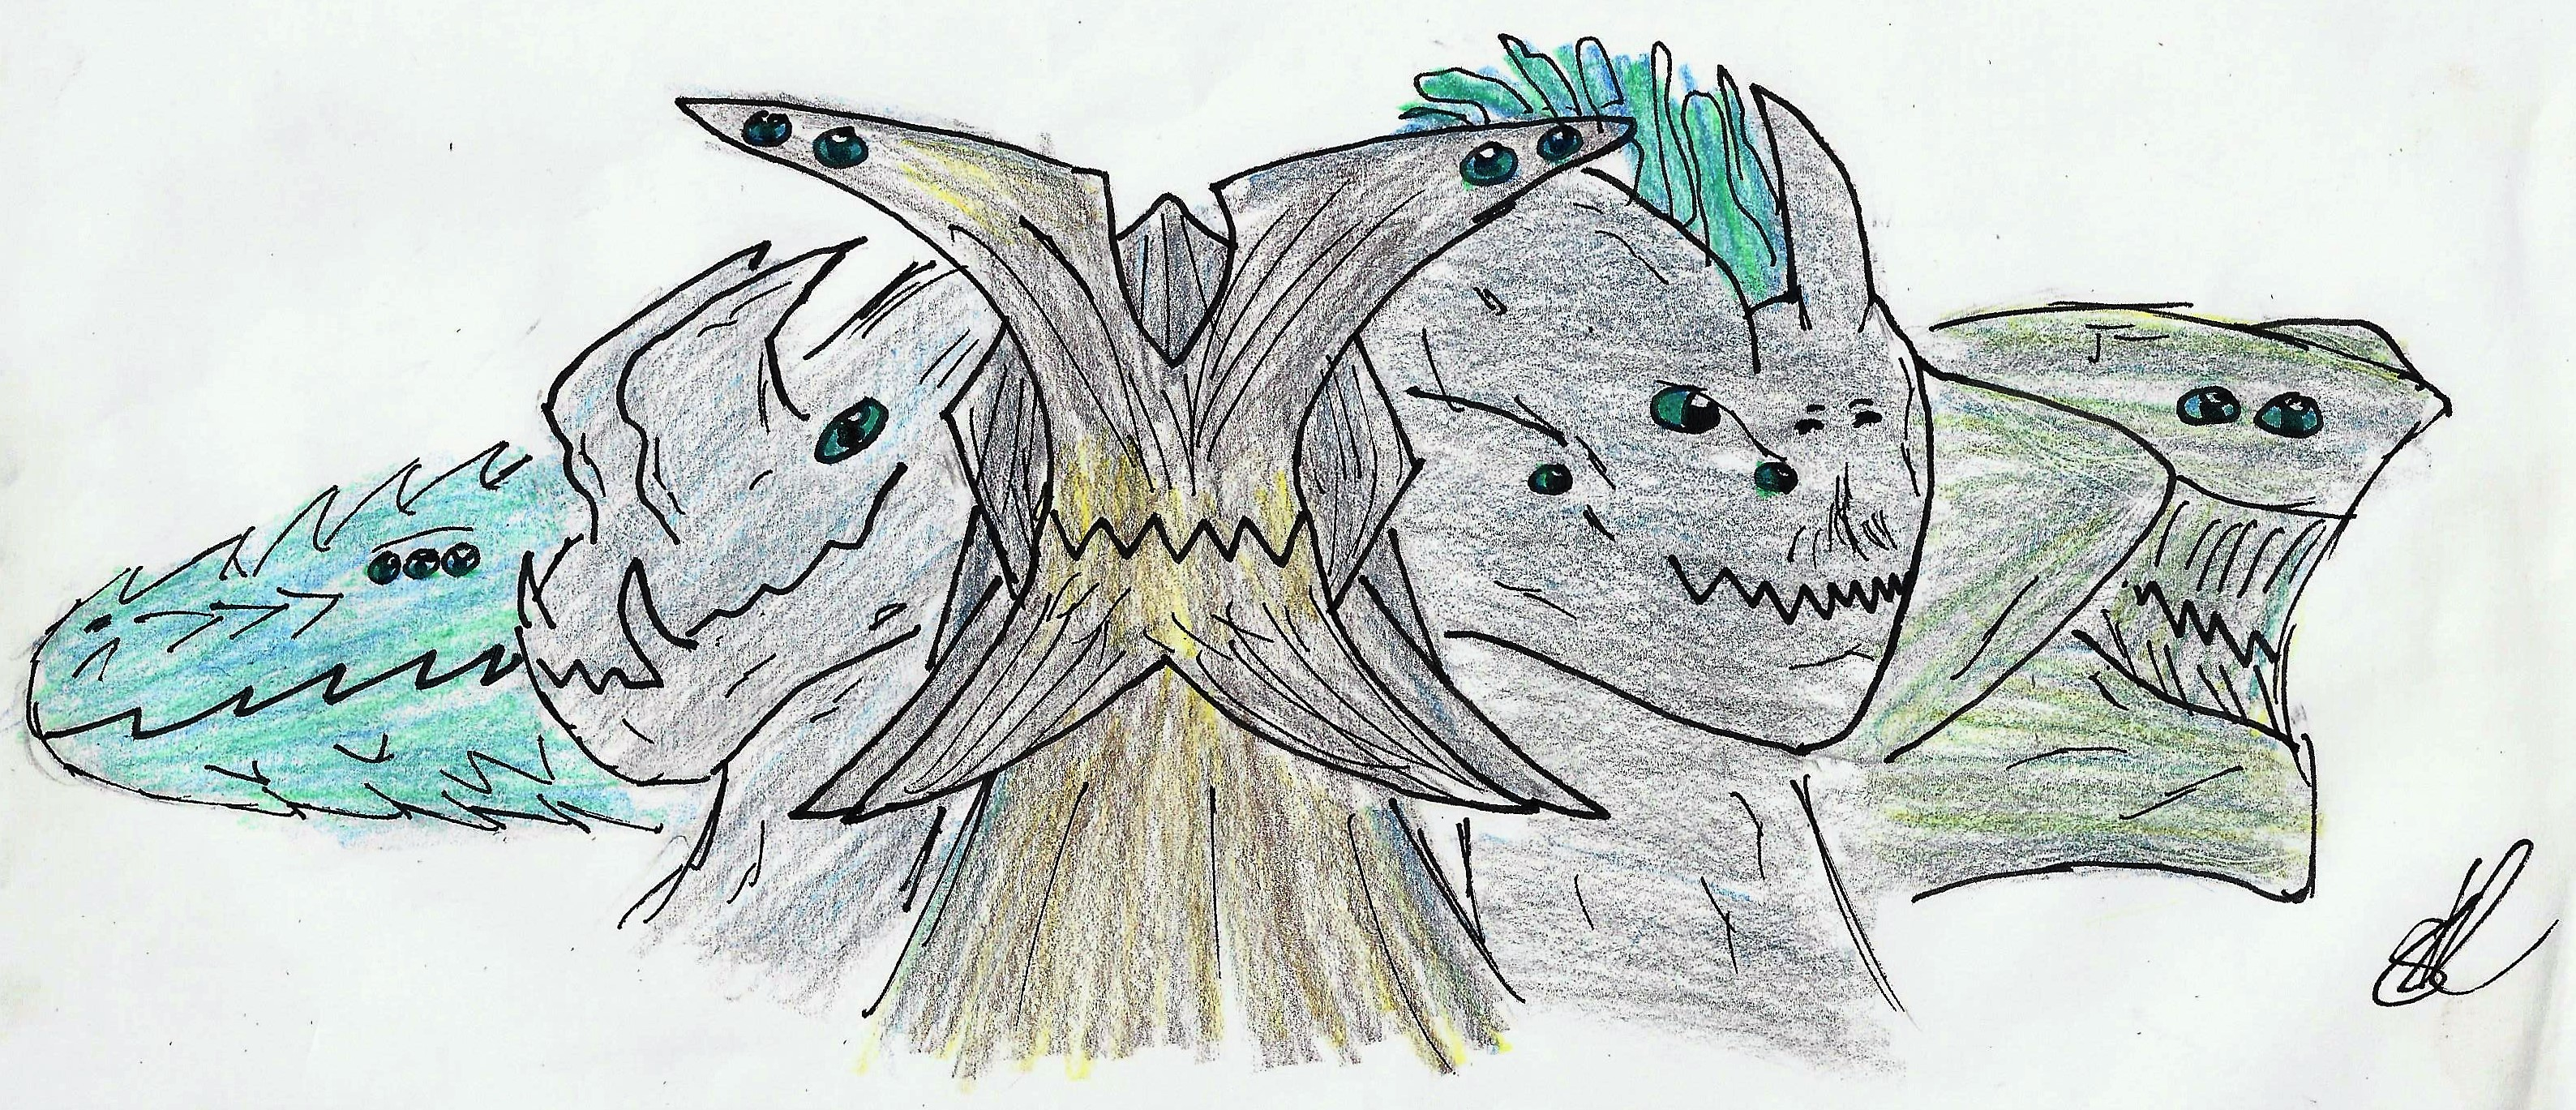 Pacific Rim Kaiju Weasyl How to draw a godzilla. pacific rim kaiju weasyl